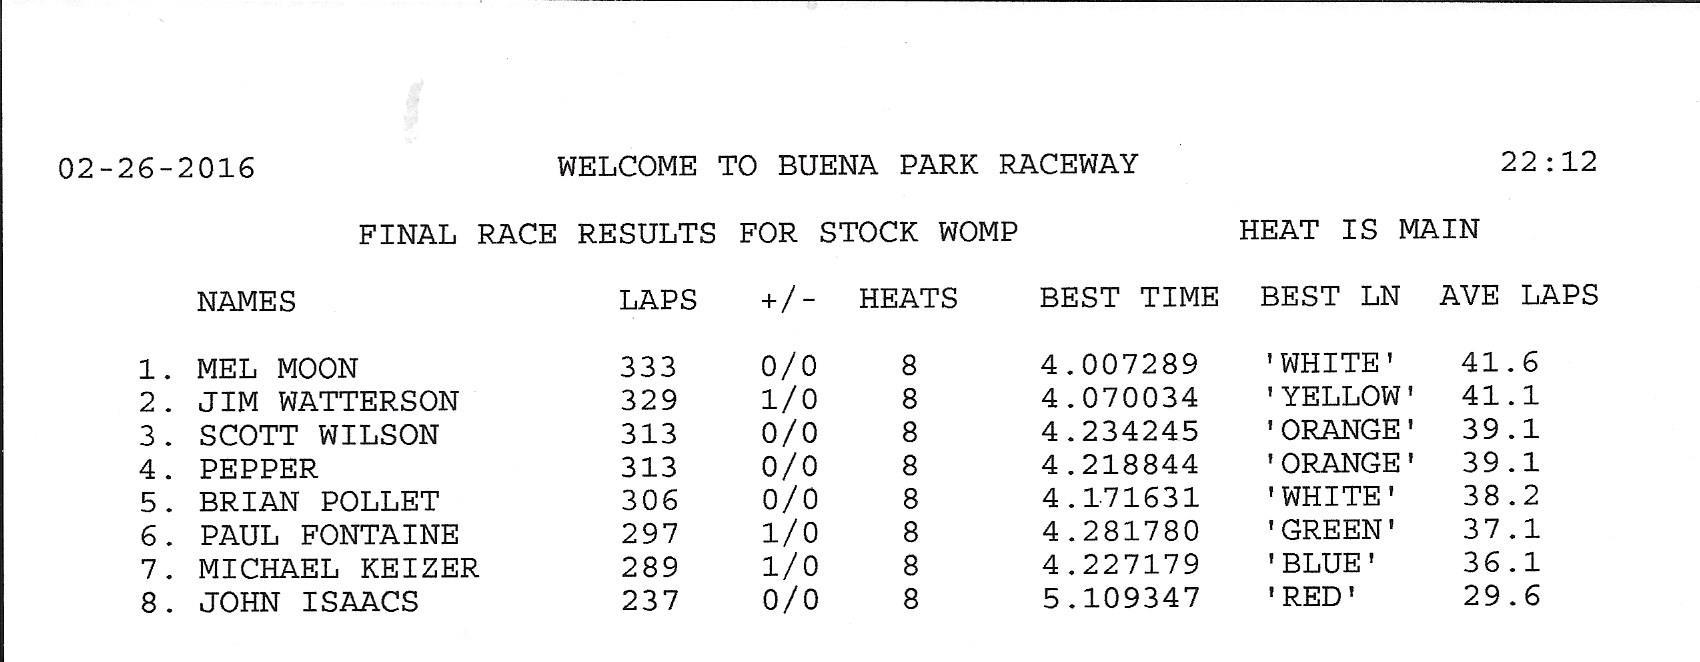 22616 womp results.jpg